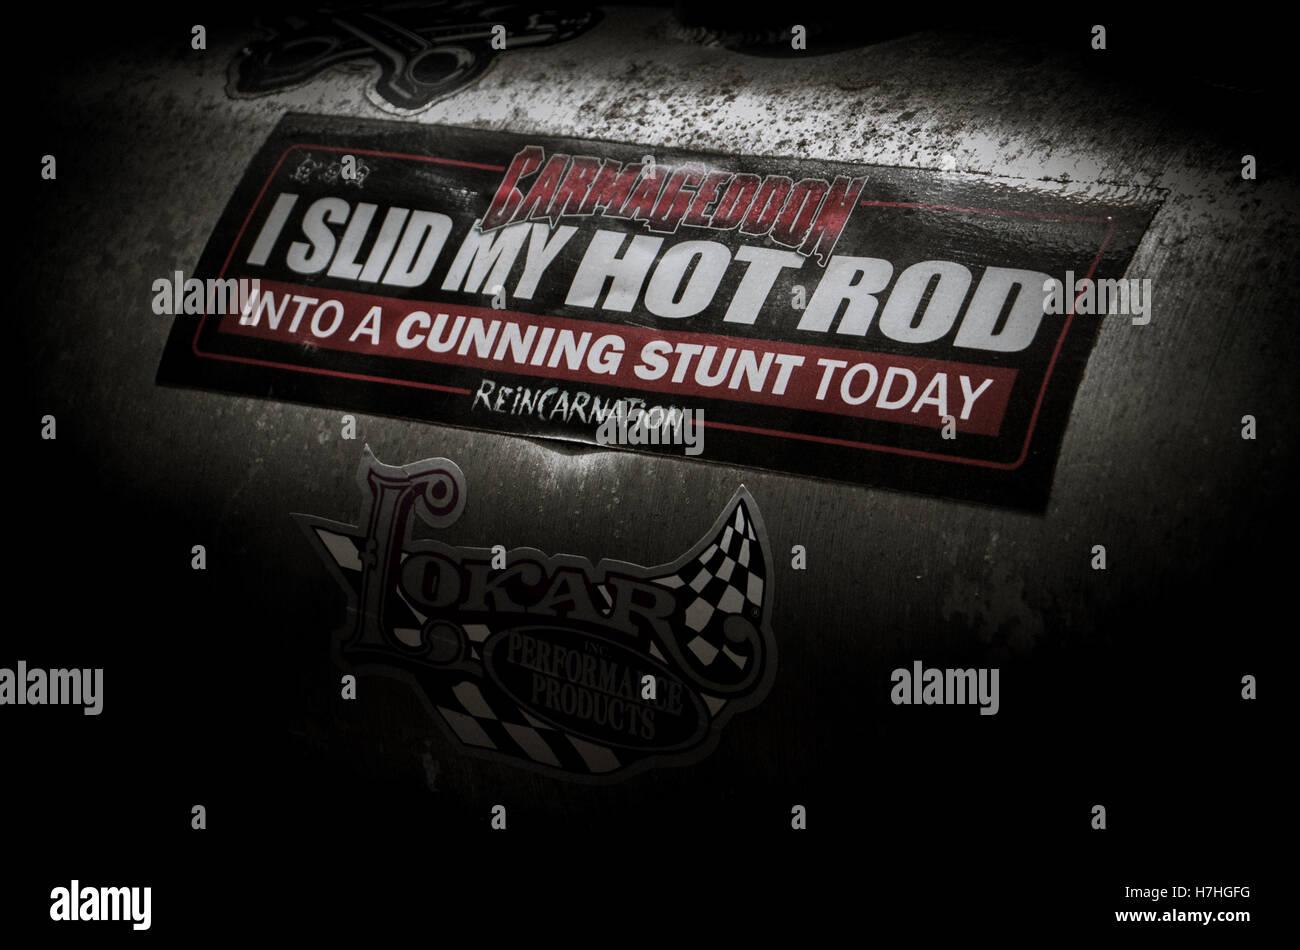 Cunning Stunts - Stock Image